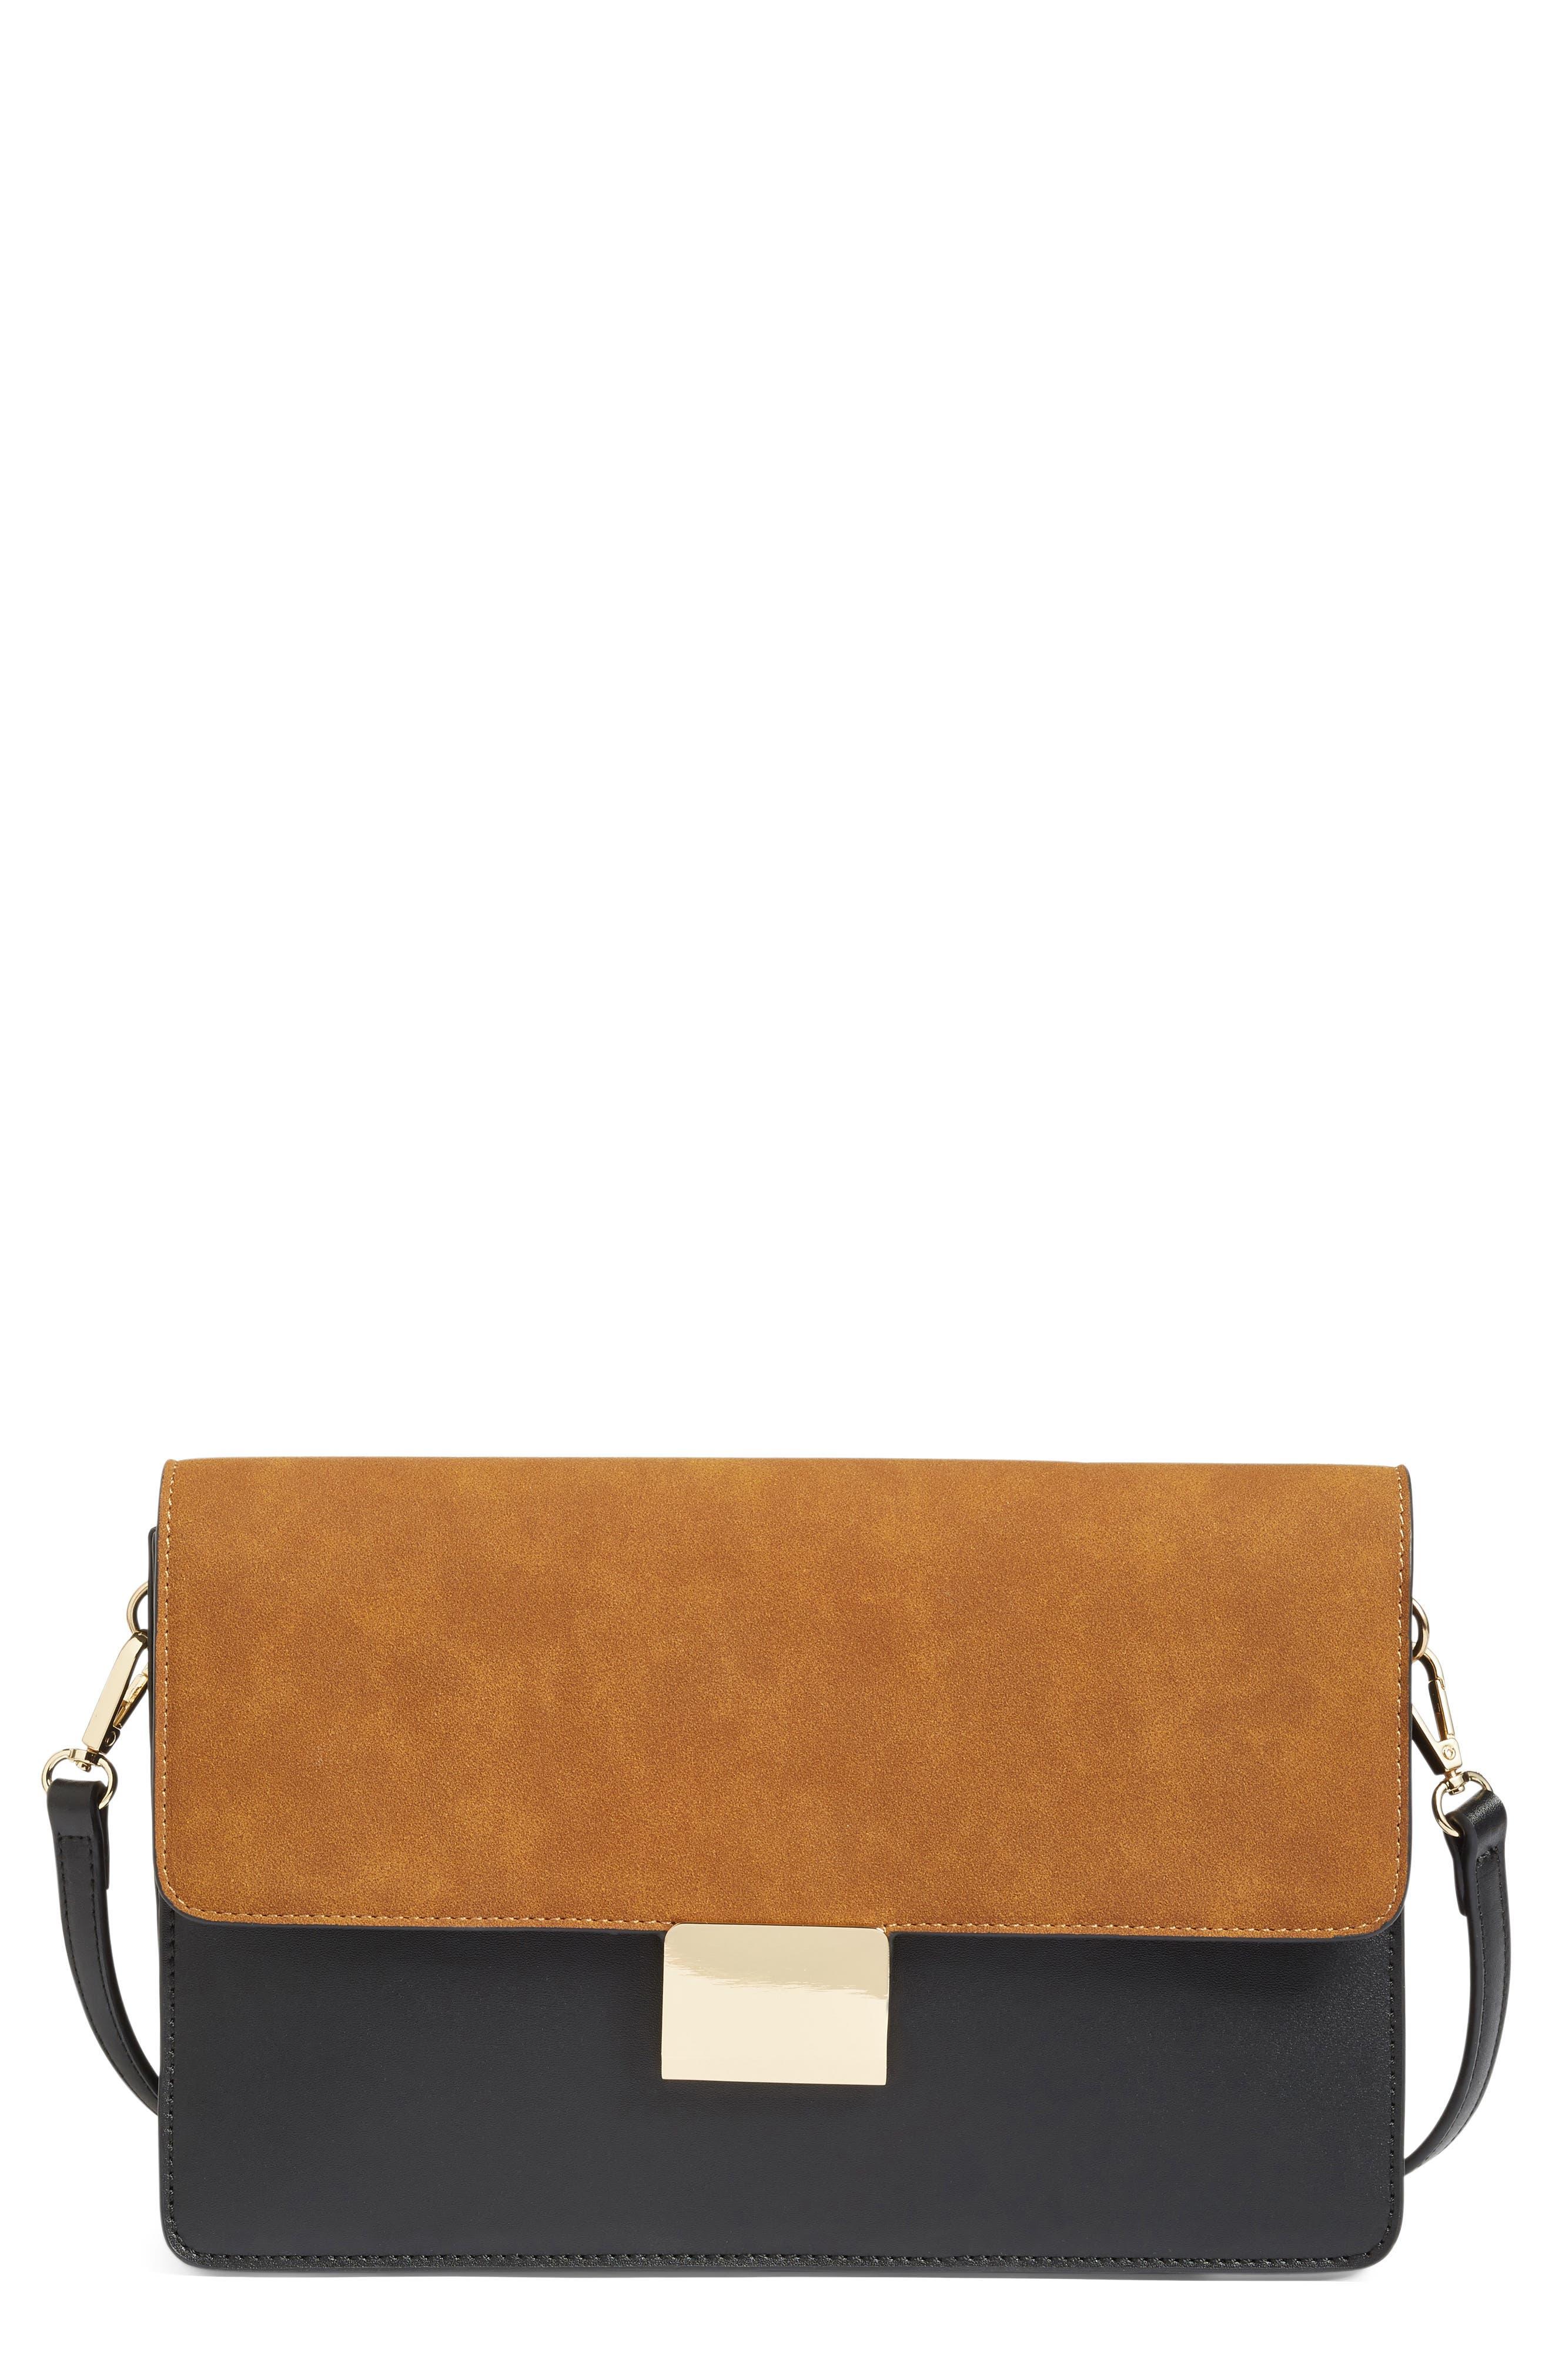 Leighton Colorblock Faux Leather Crossbody Bag,                             Main thumbnail 1, color,                             001